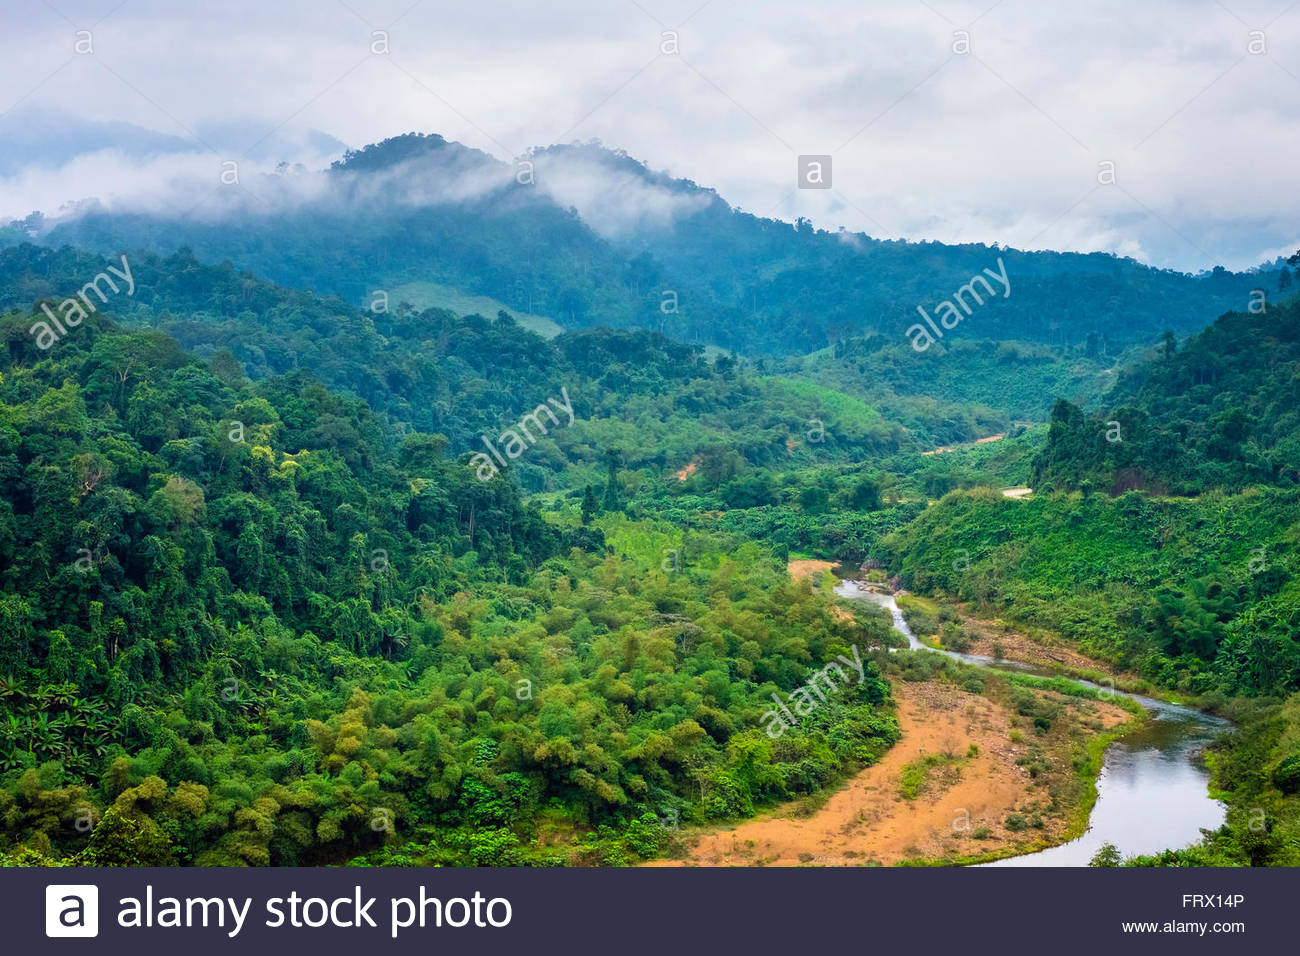 Jungle landscape along Ho Chi Minh Highway West, Quang Ninh District, Quang Bình Province, Vietnam - Stock Image